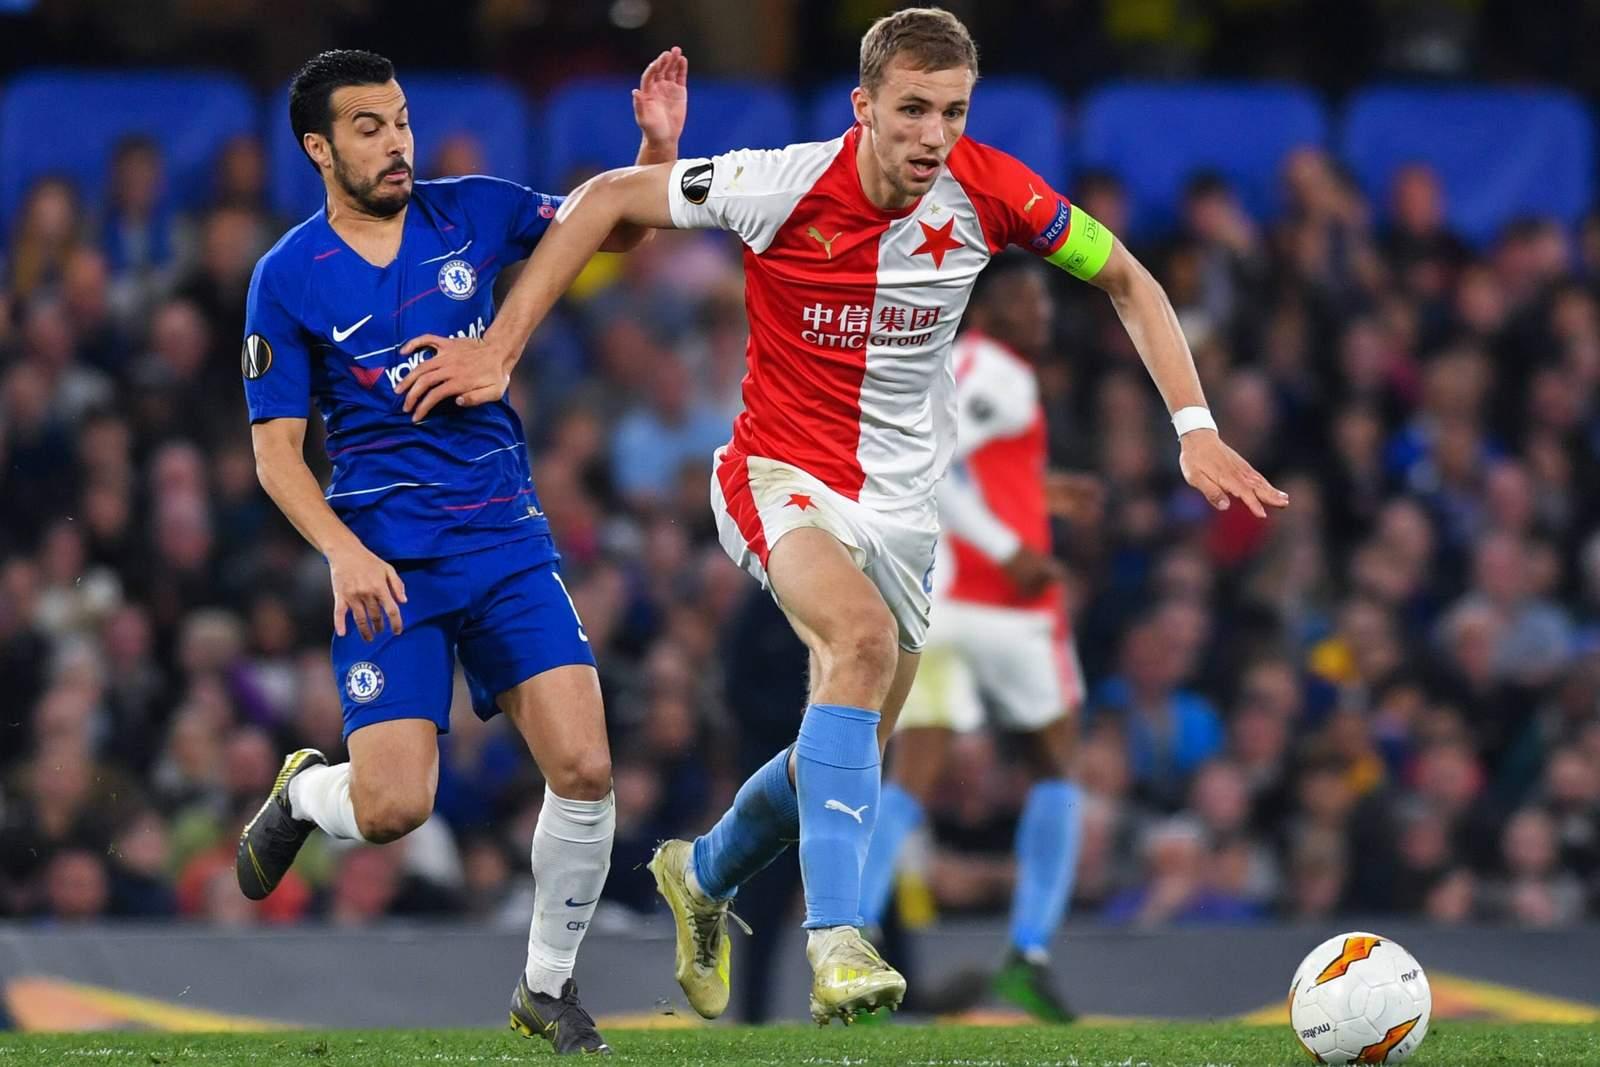 Tomas Soucek von Slavia Prag gegen Pedro vom FC Chelsea